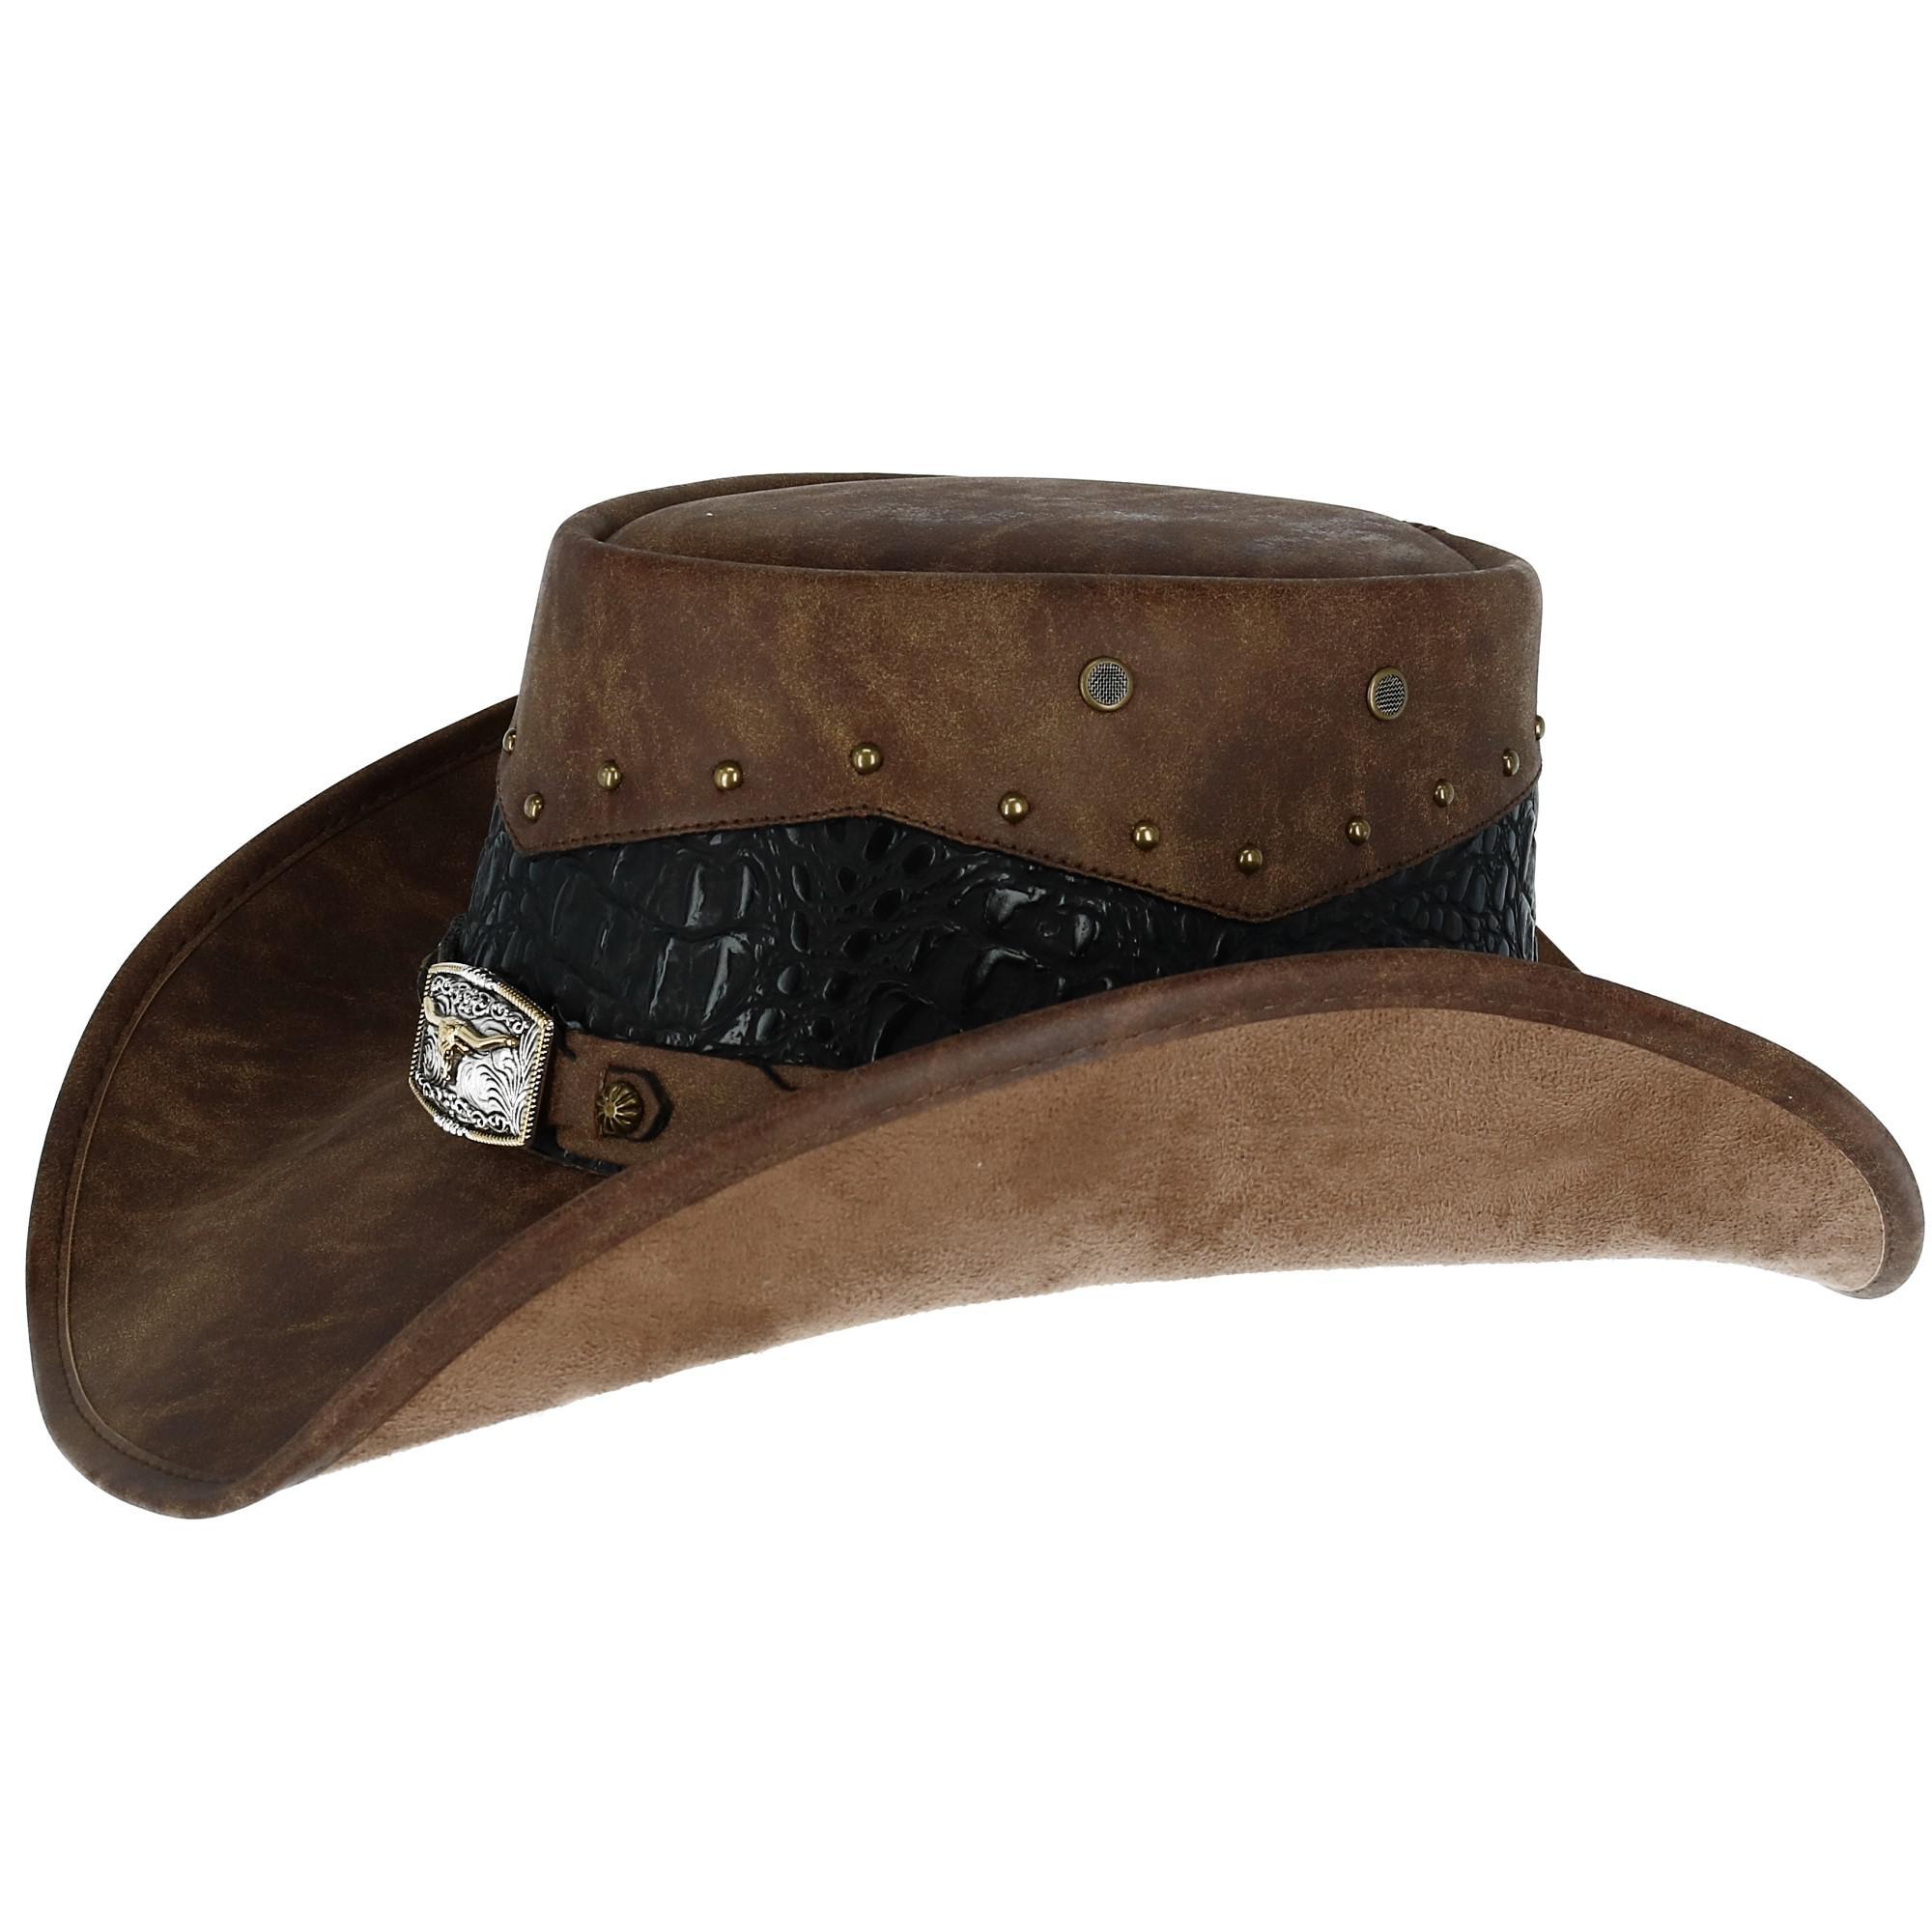 Kenny K Men's Faux Leather Western Hat with Medallion Detailed Crown - image 3 de 5